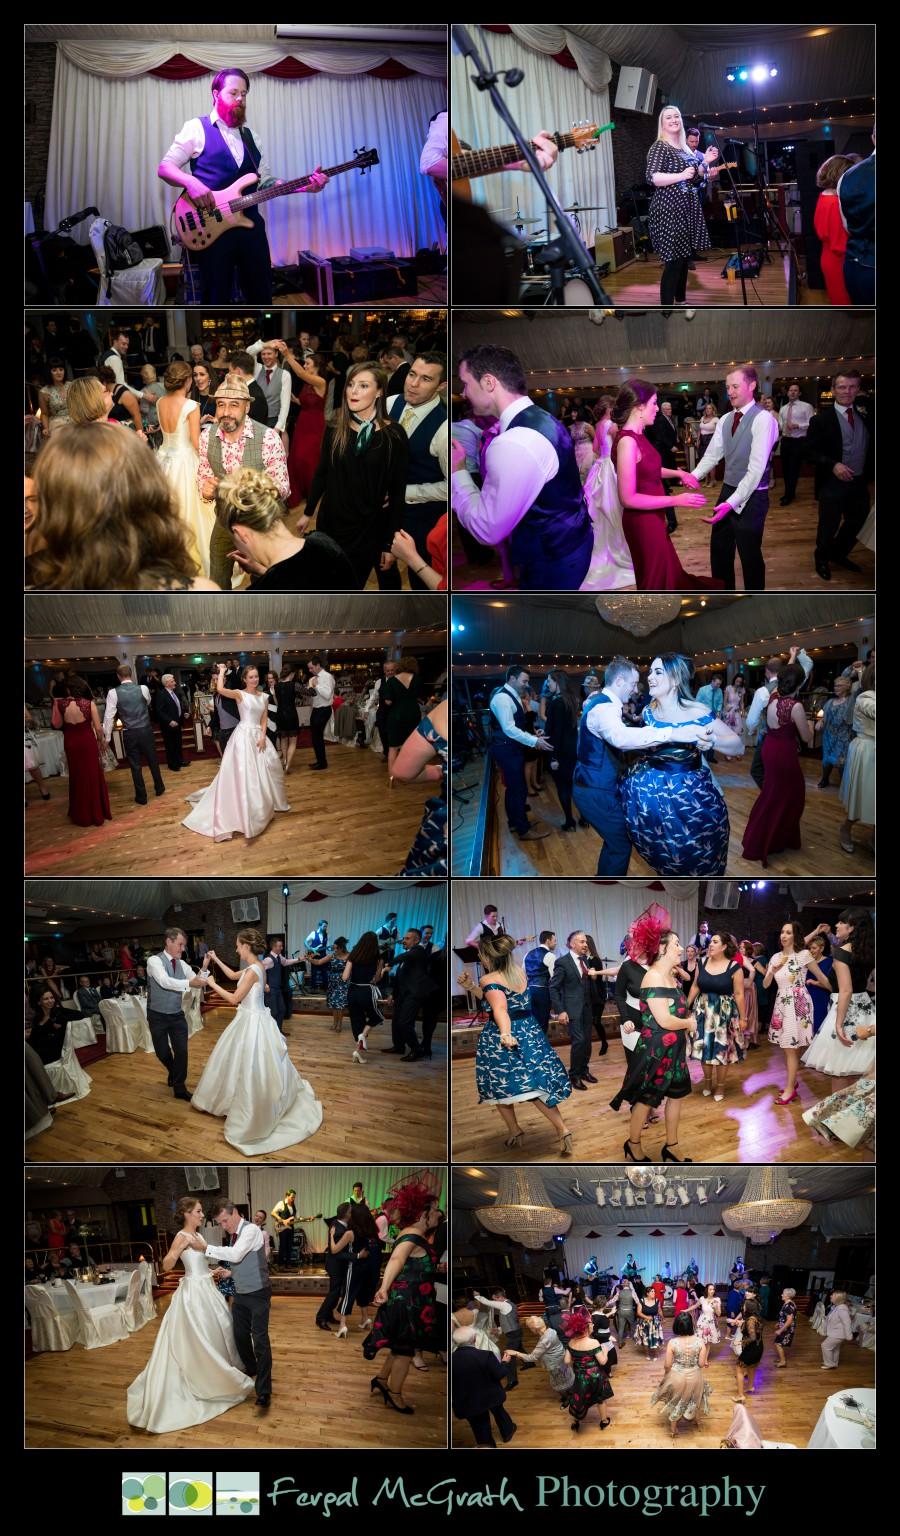 Harveys Point Hotel Winter Weddings photos taken on the dancefloor at the wedding